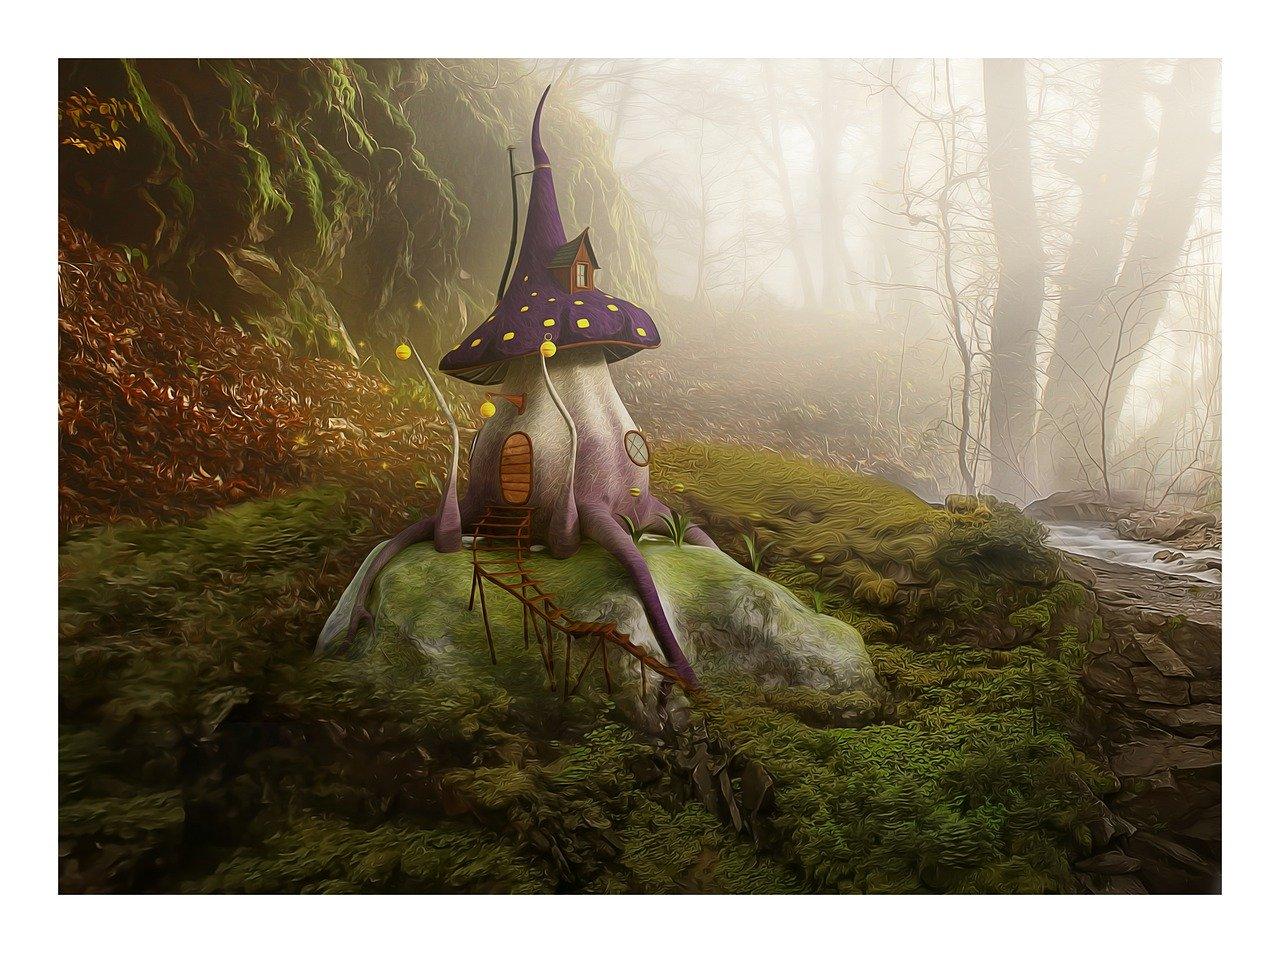 mushroom, magic, forest